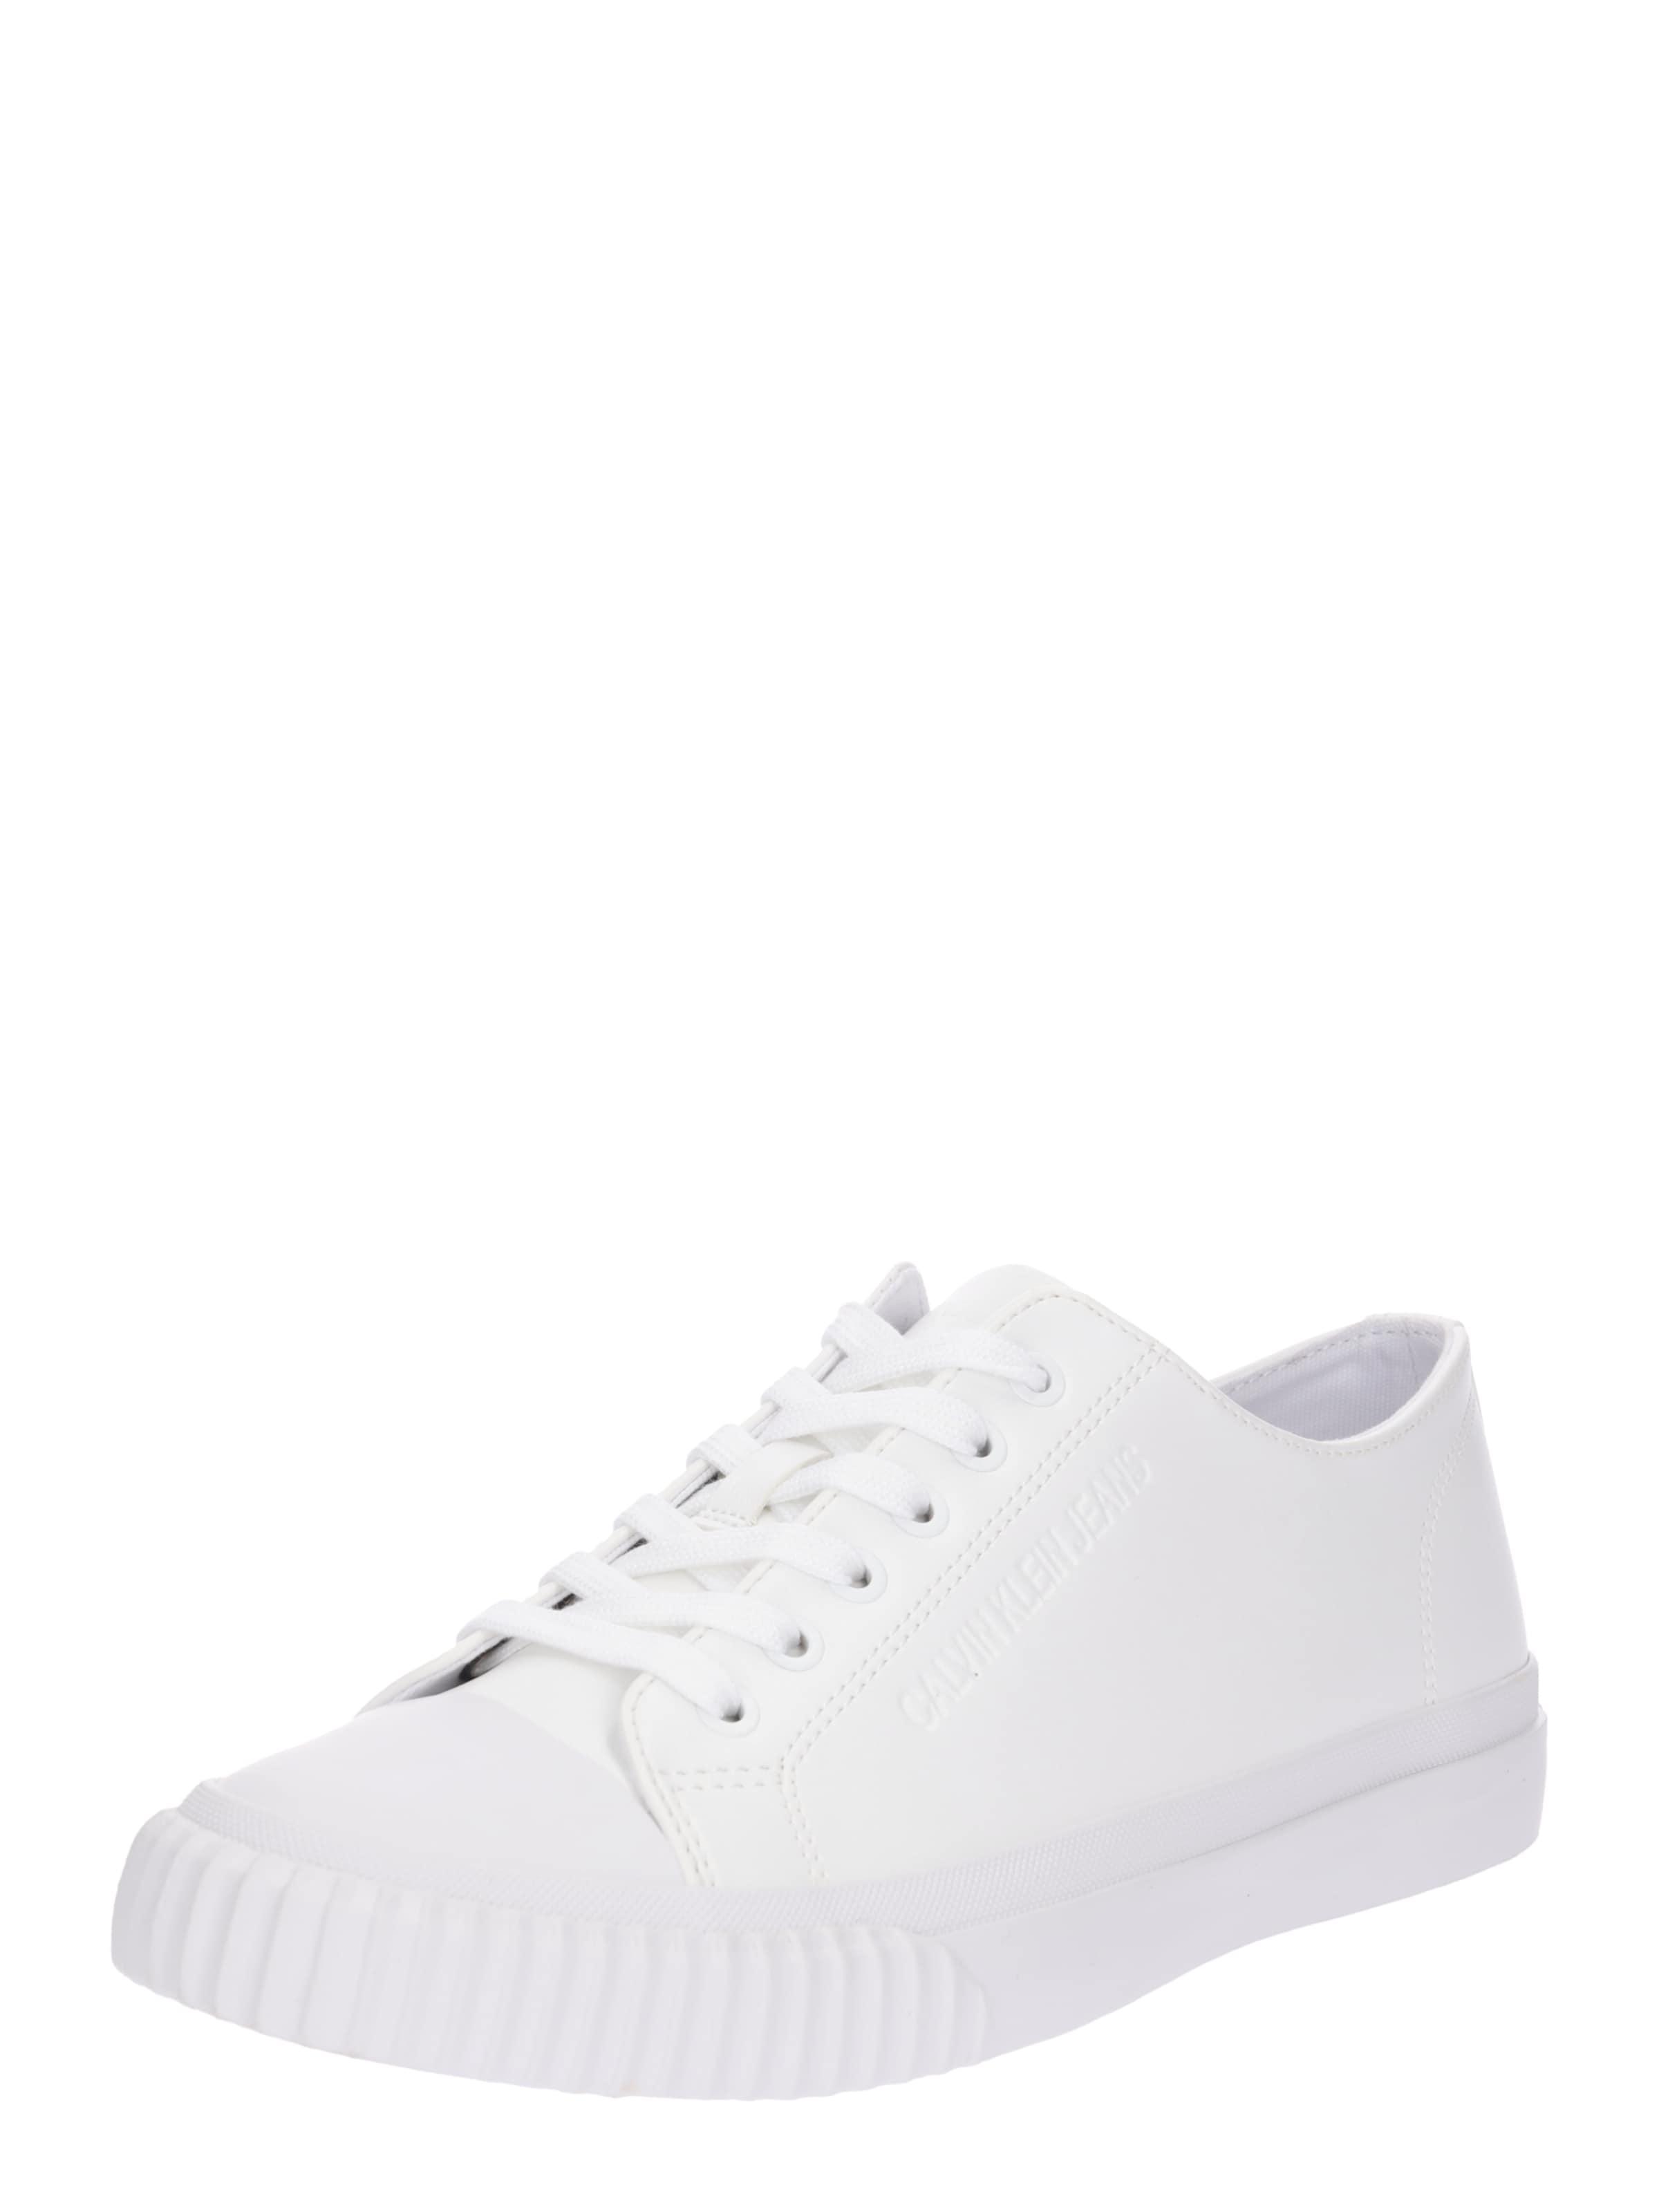 Calvin Klein Jeans Sneaker  IACO